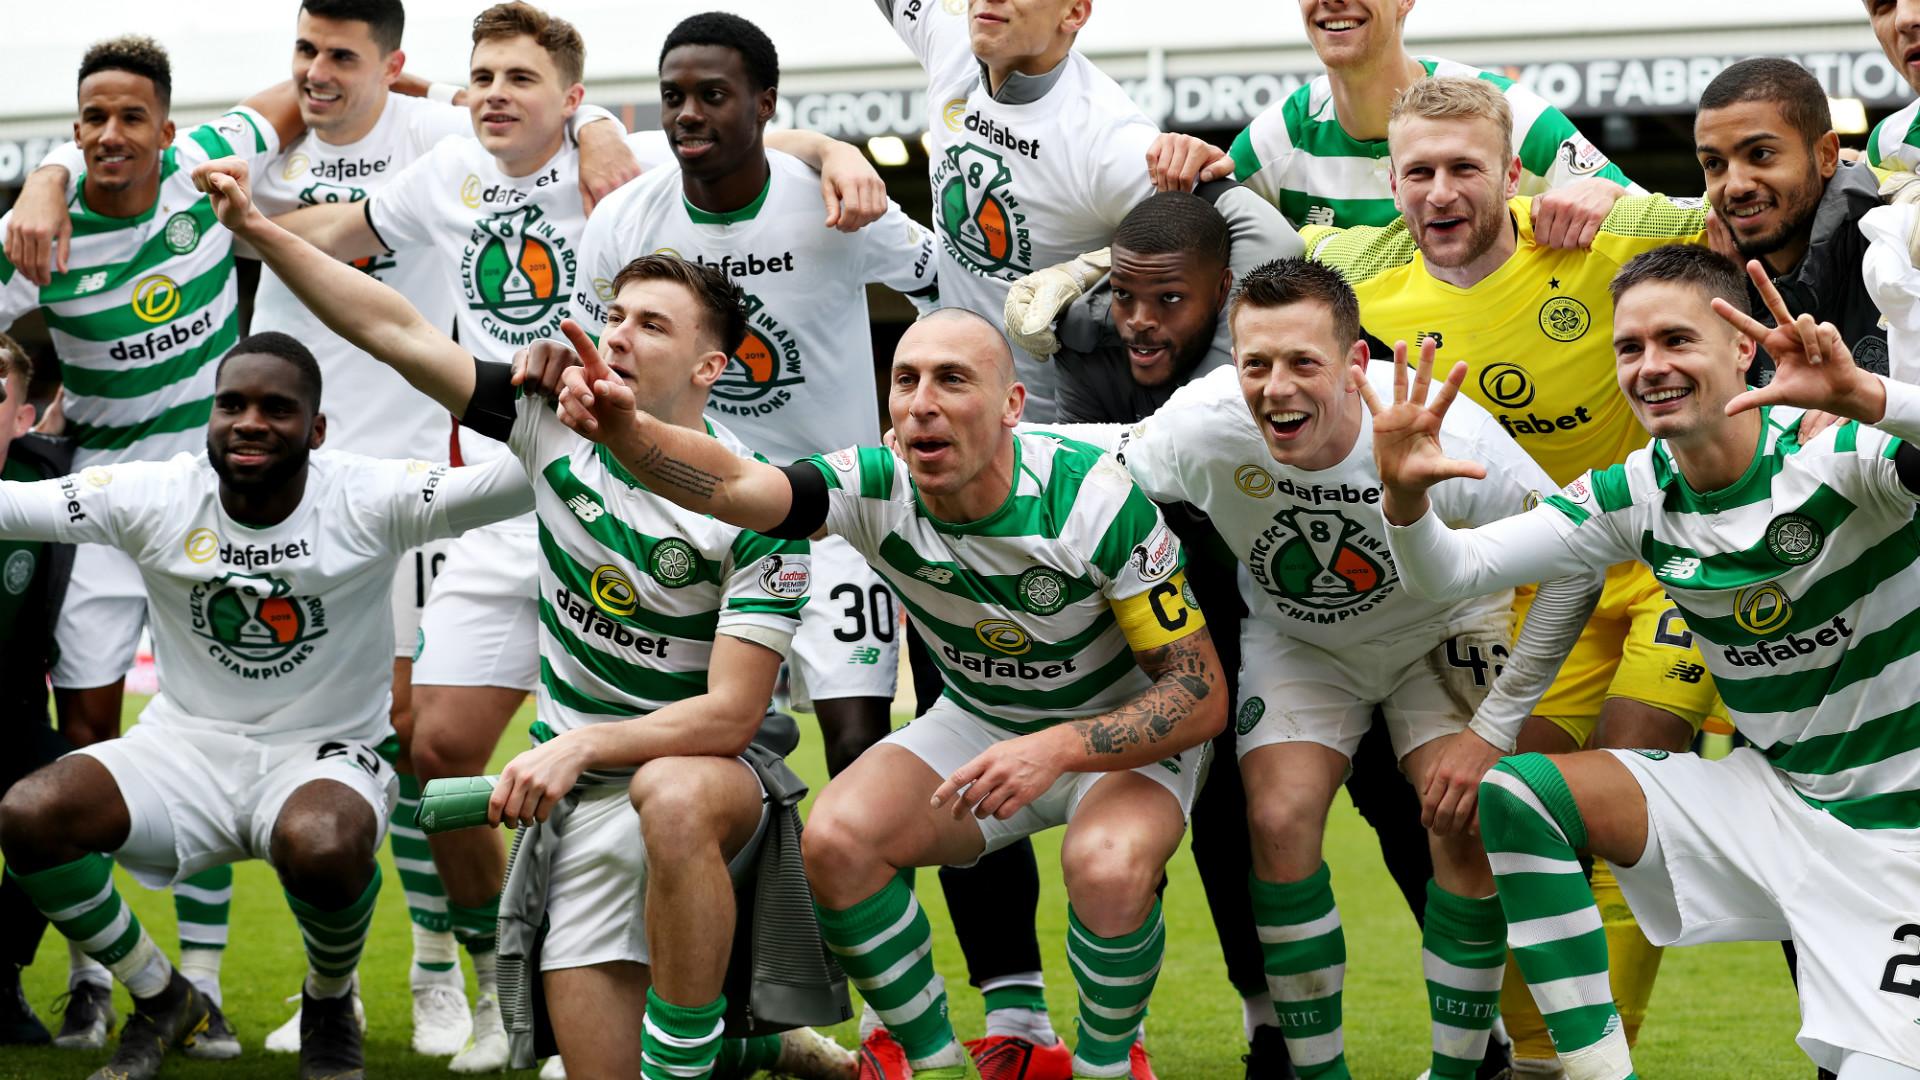 Celtic celebrate 2018-19